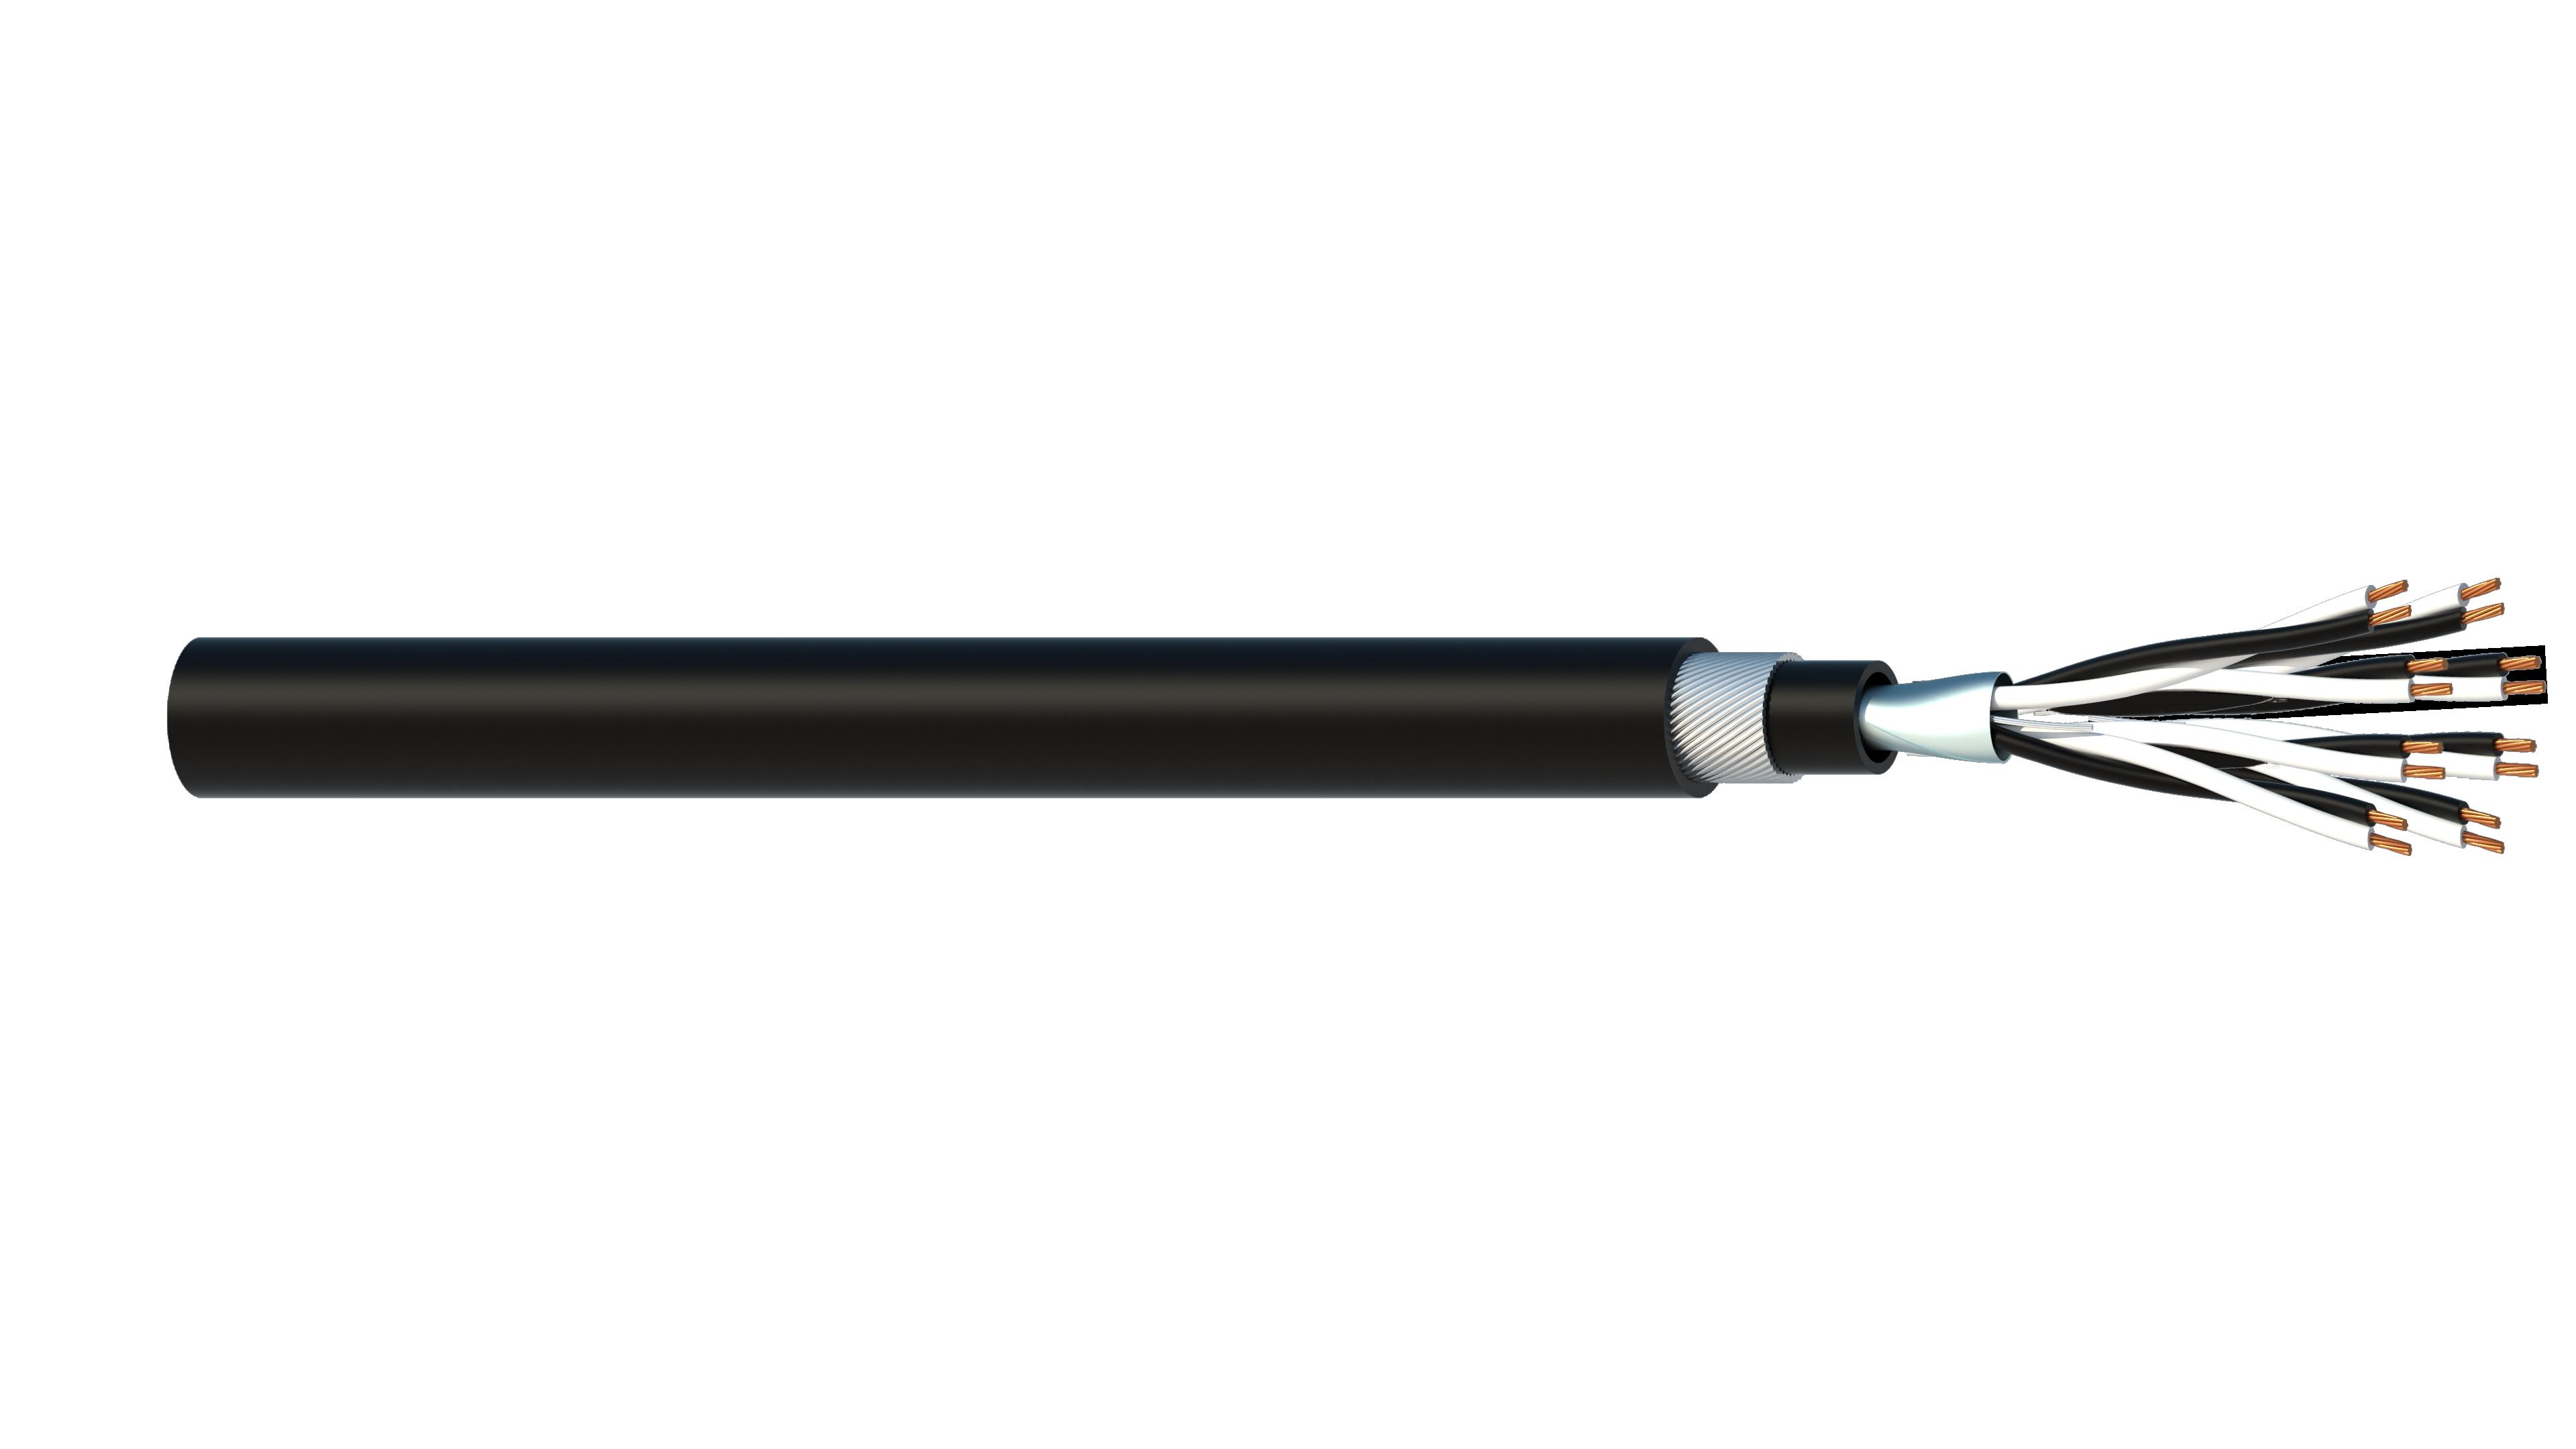 8 Pair 0.5mm2 Cu/PVC/OS/PVC/SWA/PVC Maser Instrumentation Cable - Black Sheath